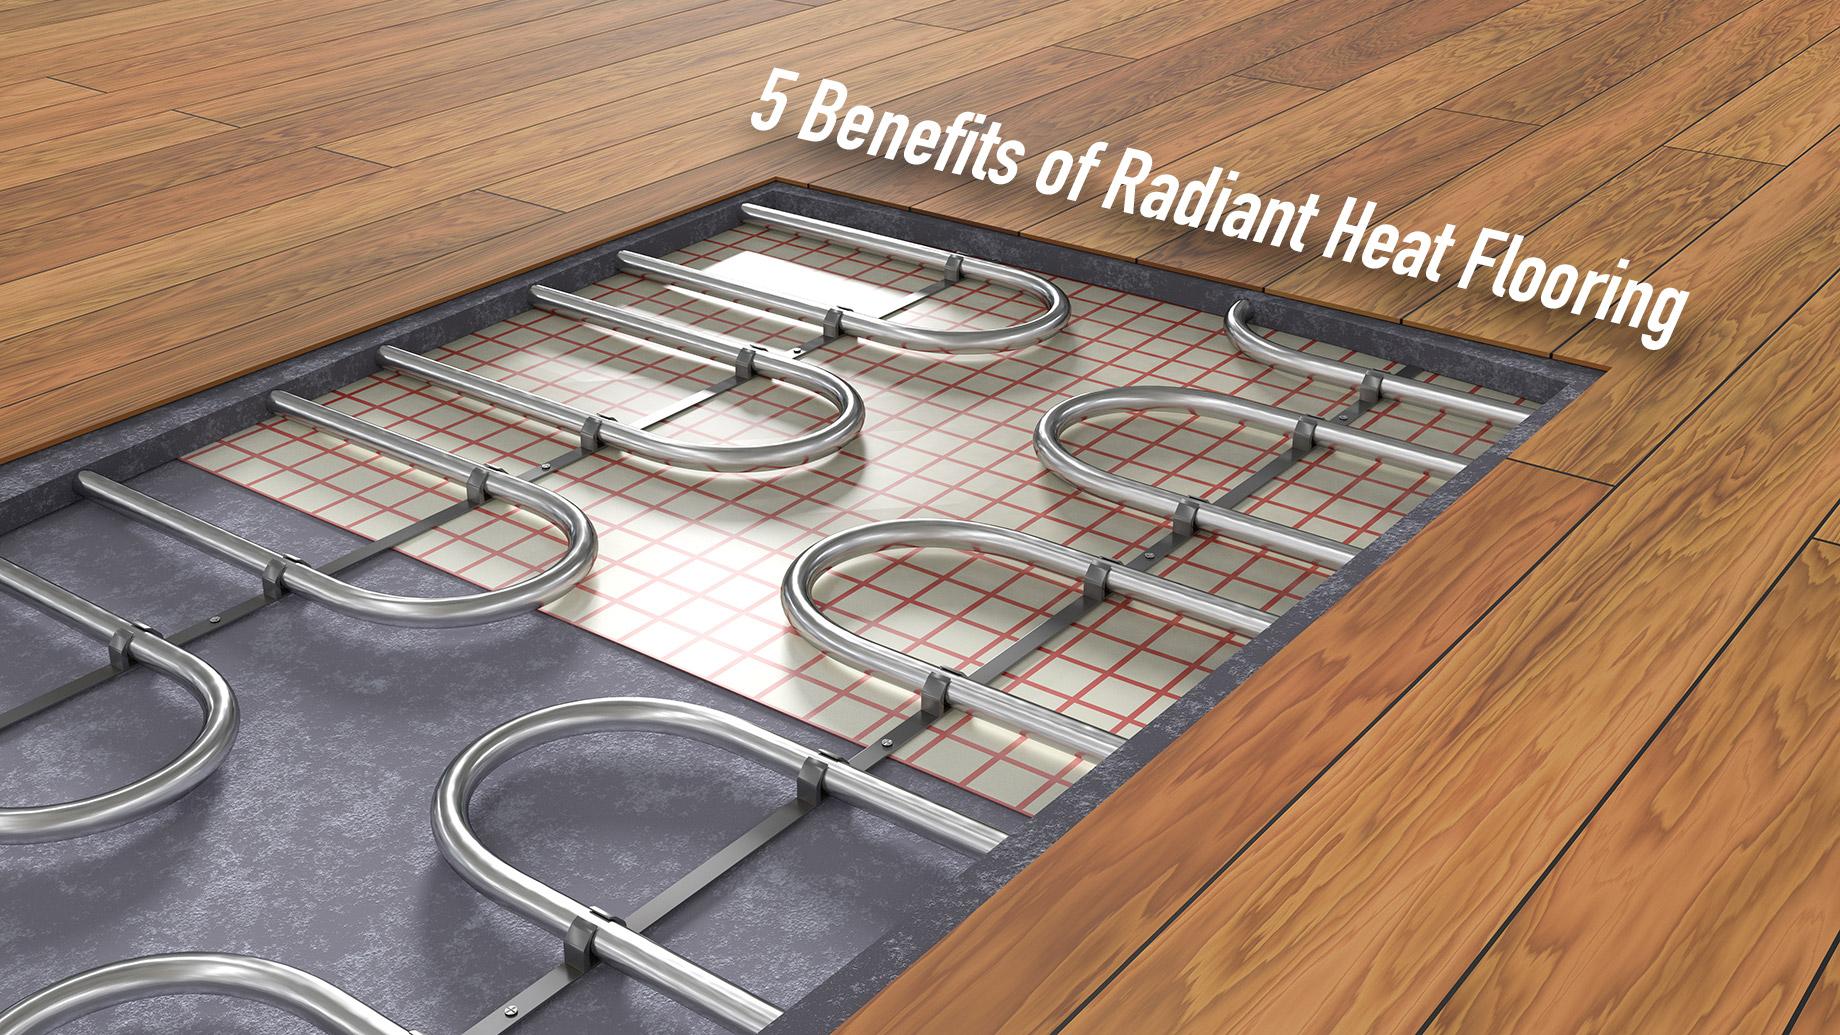 5 Benefits of Radiant Heat Flooring